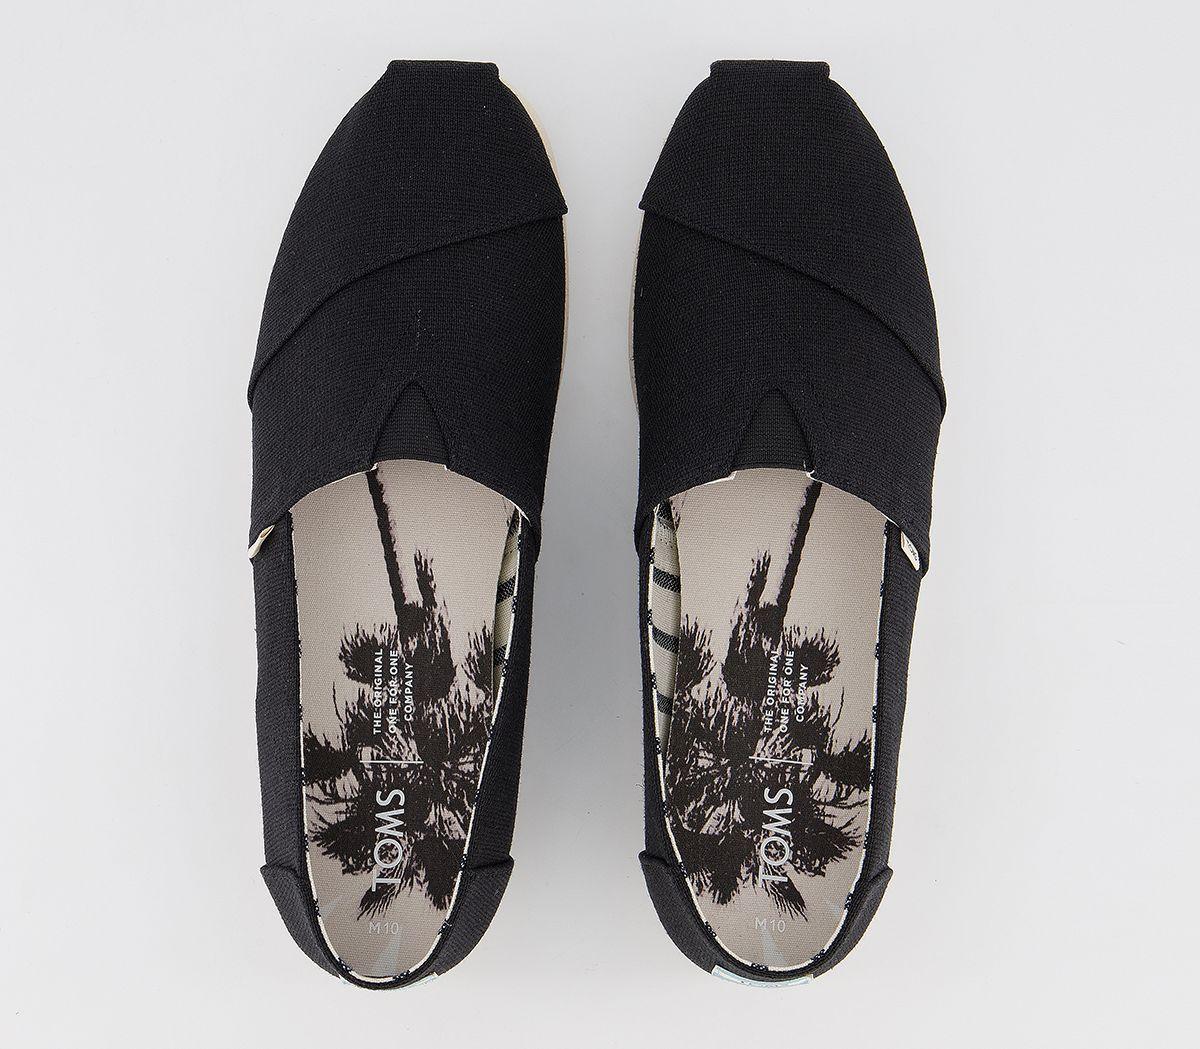 Da-Uomo-Toms-Toms-Classic-Alpargata-SLIP-ONS-BLACK-Heritage-Tela-Scarpe-Casual miniatura 5